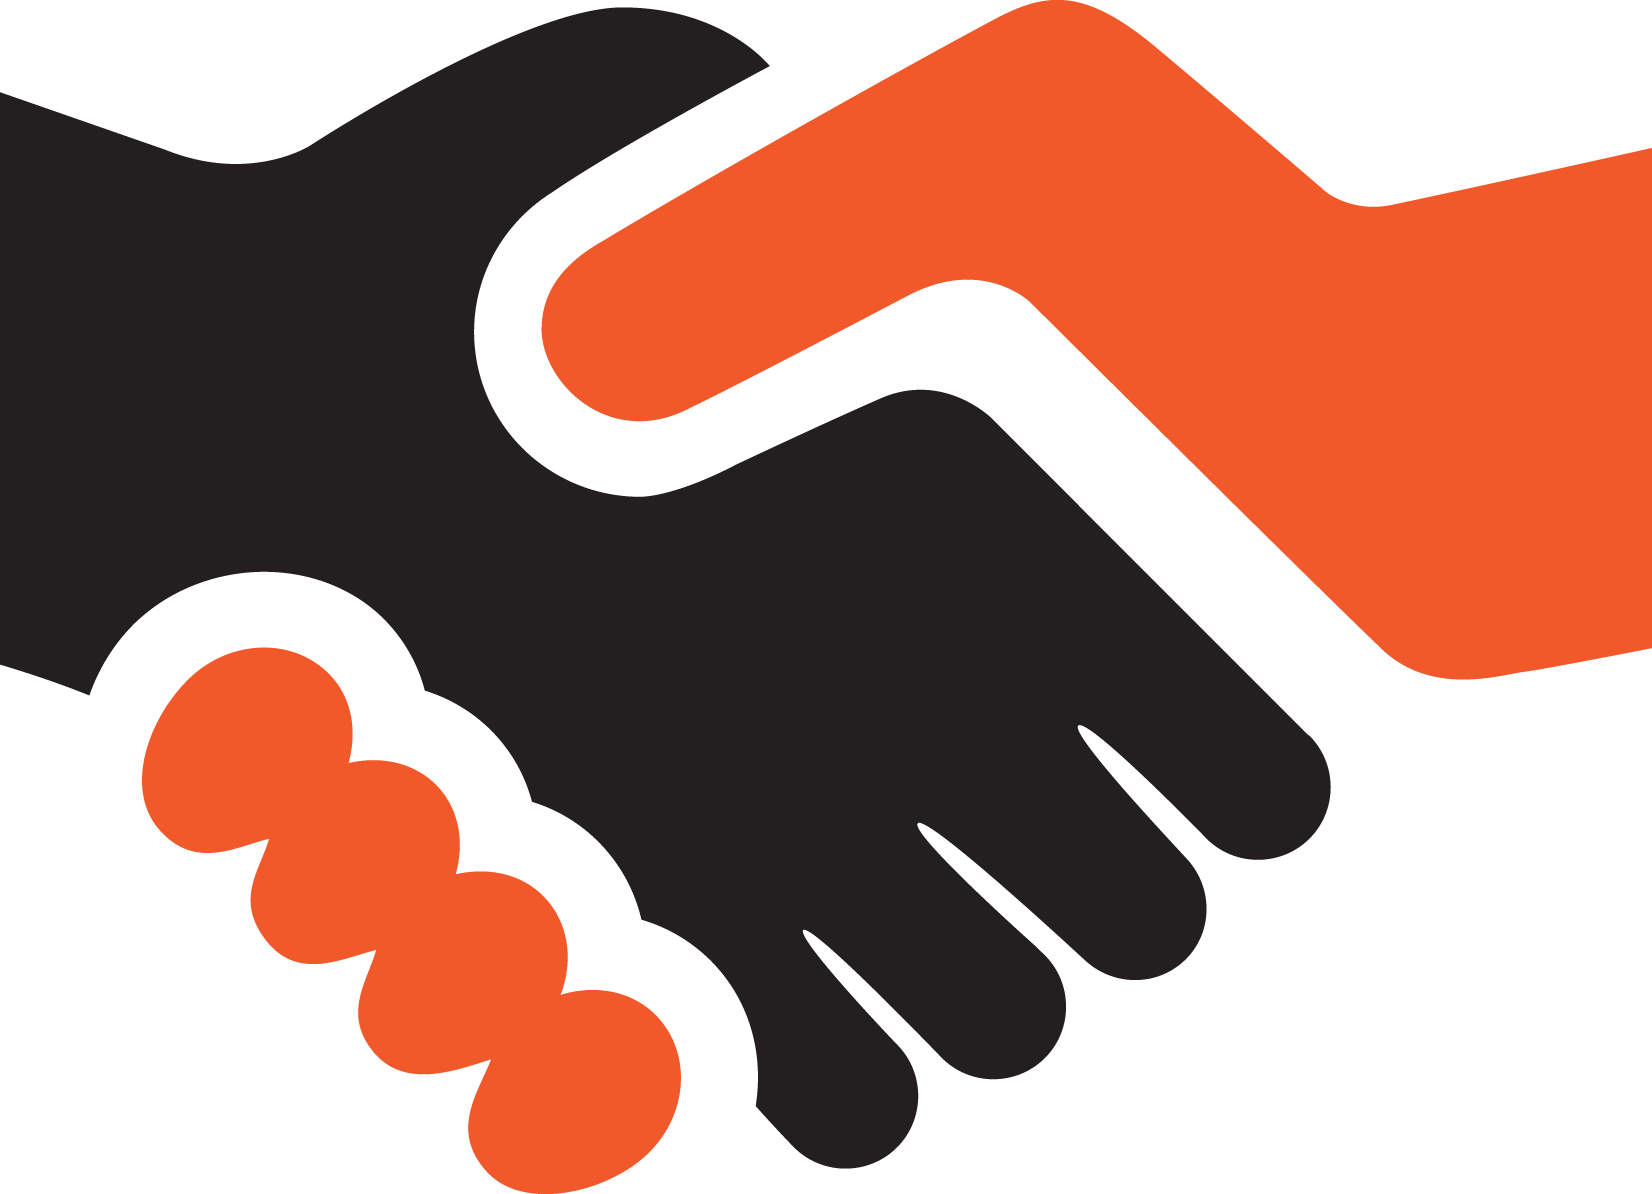 Handshake clipart micro finance. Hedgehog group holdings a